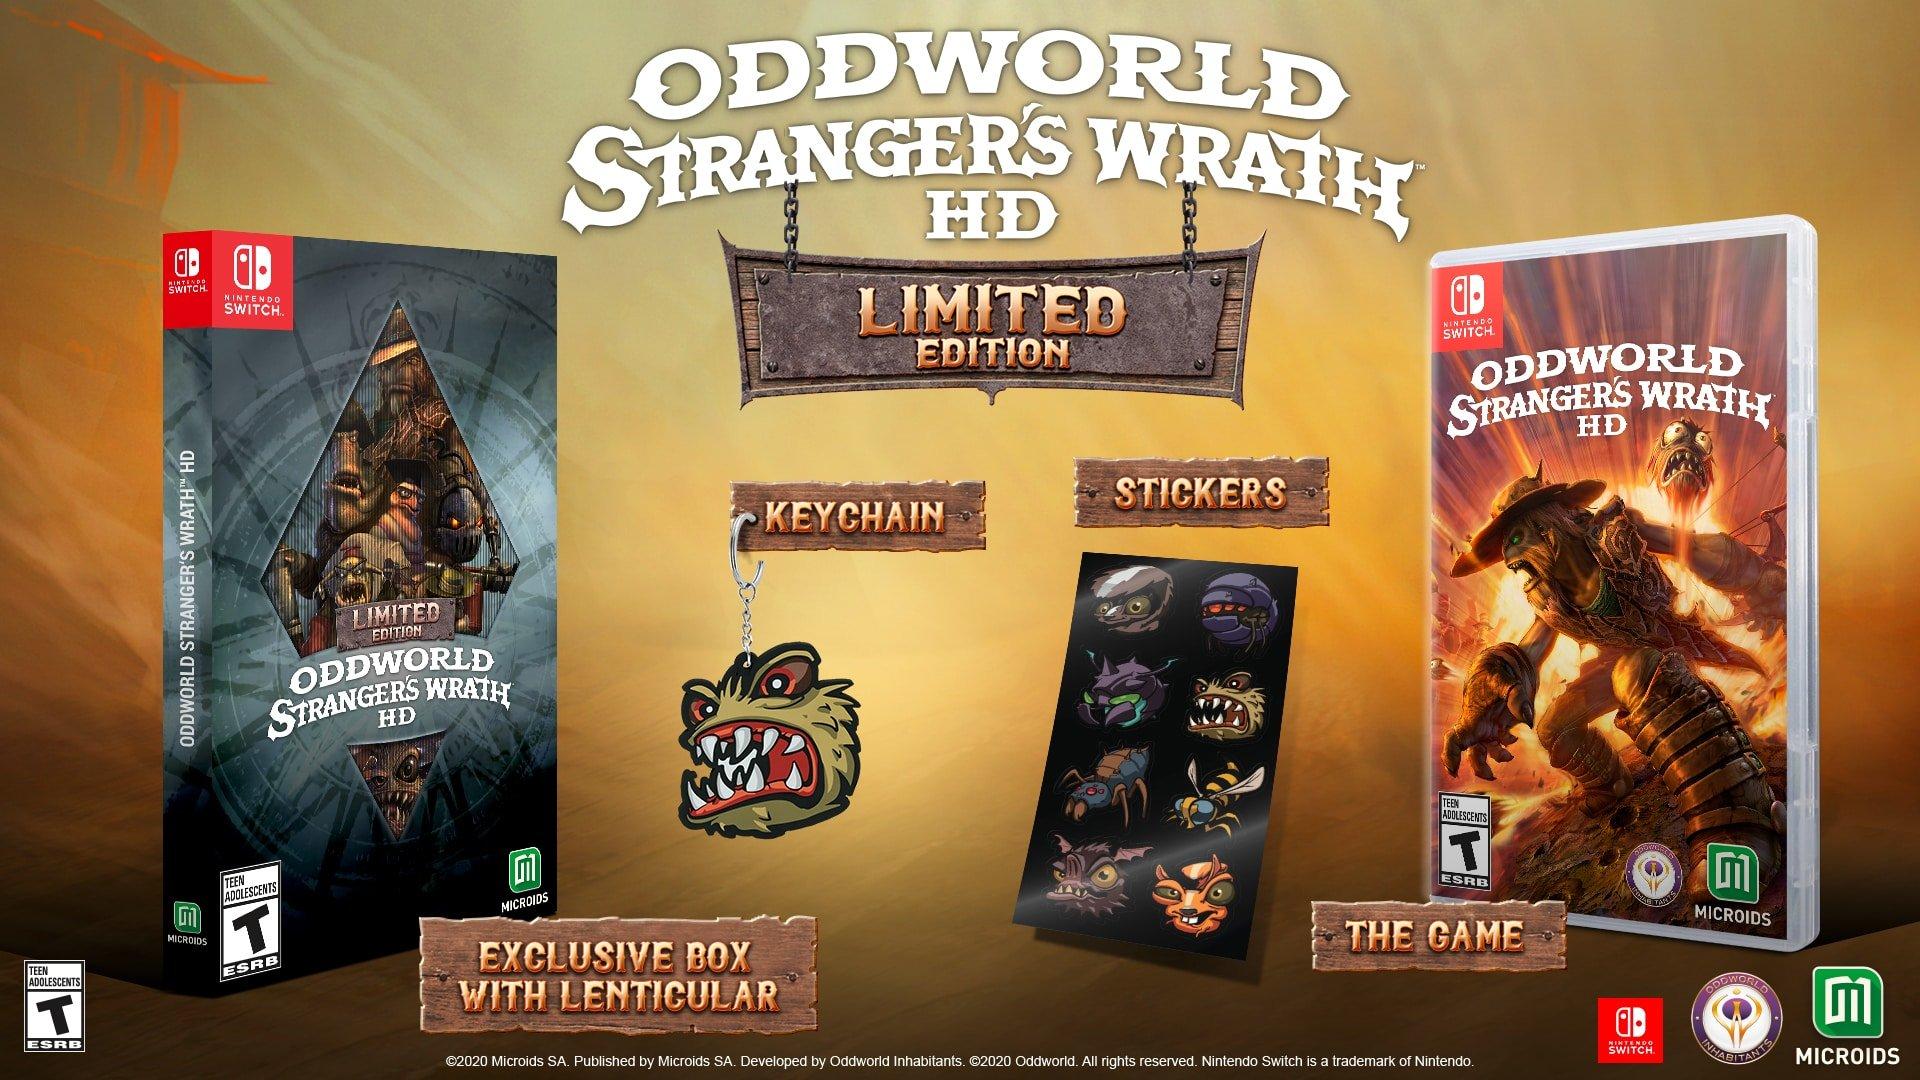 Oddworld Stranger's Wrath HD Limited Edition contest Switch